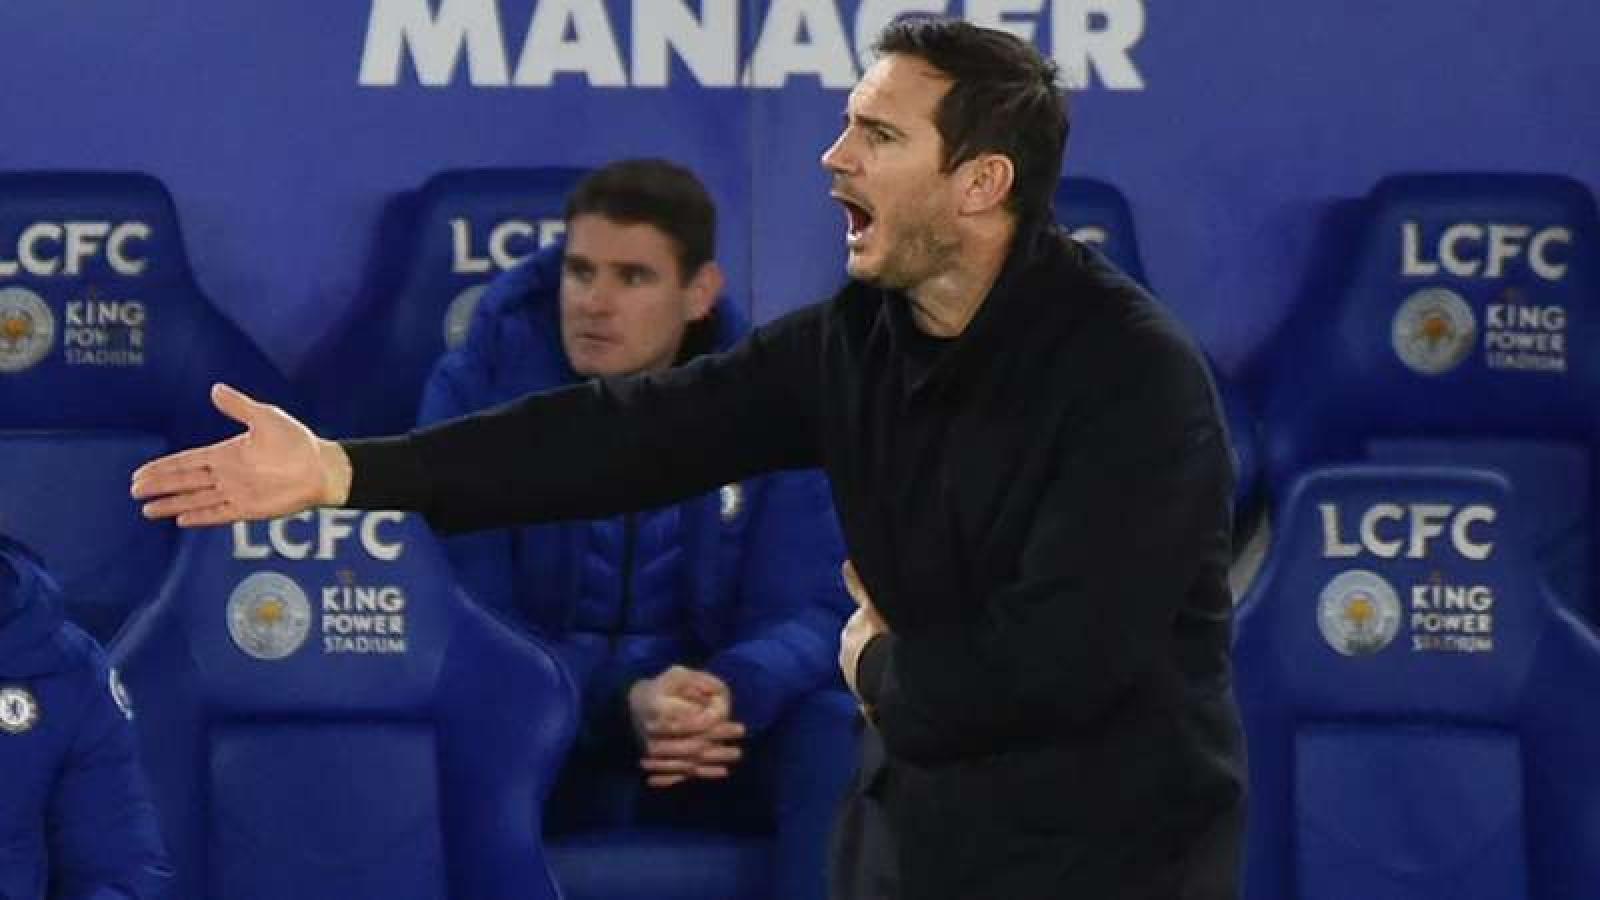 HLV Lampard thừa nhận khả năng bị Chelsea sa thải